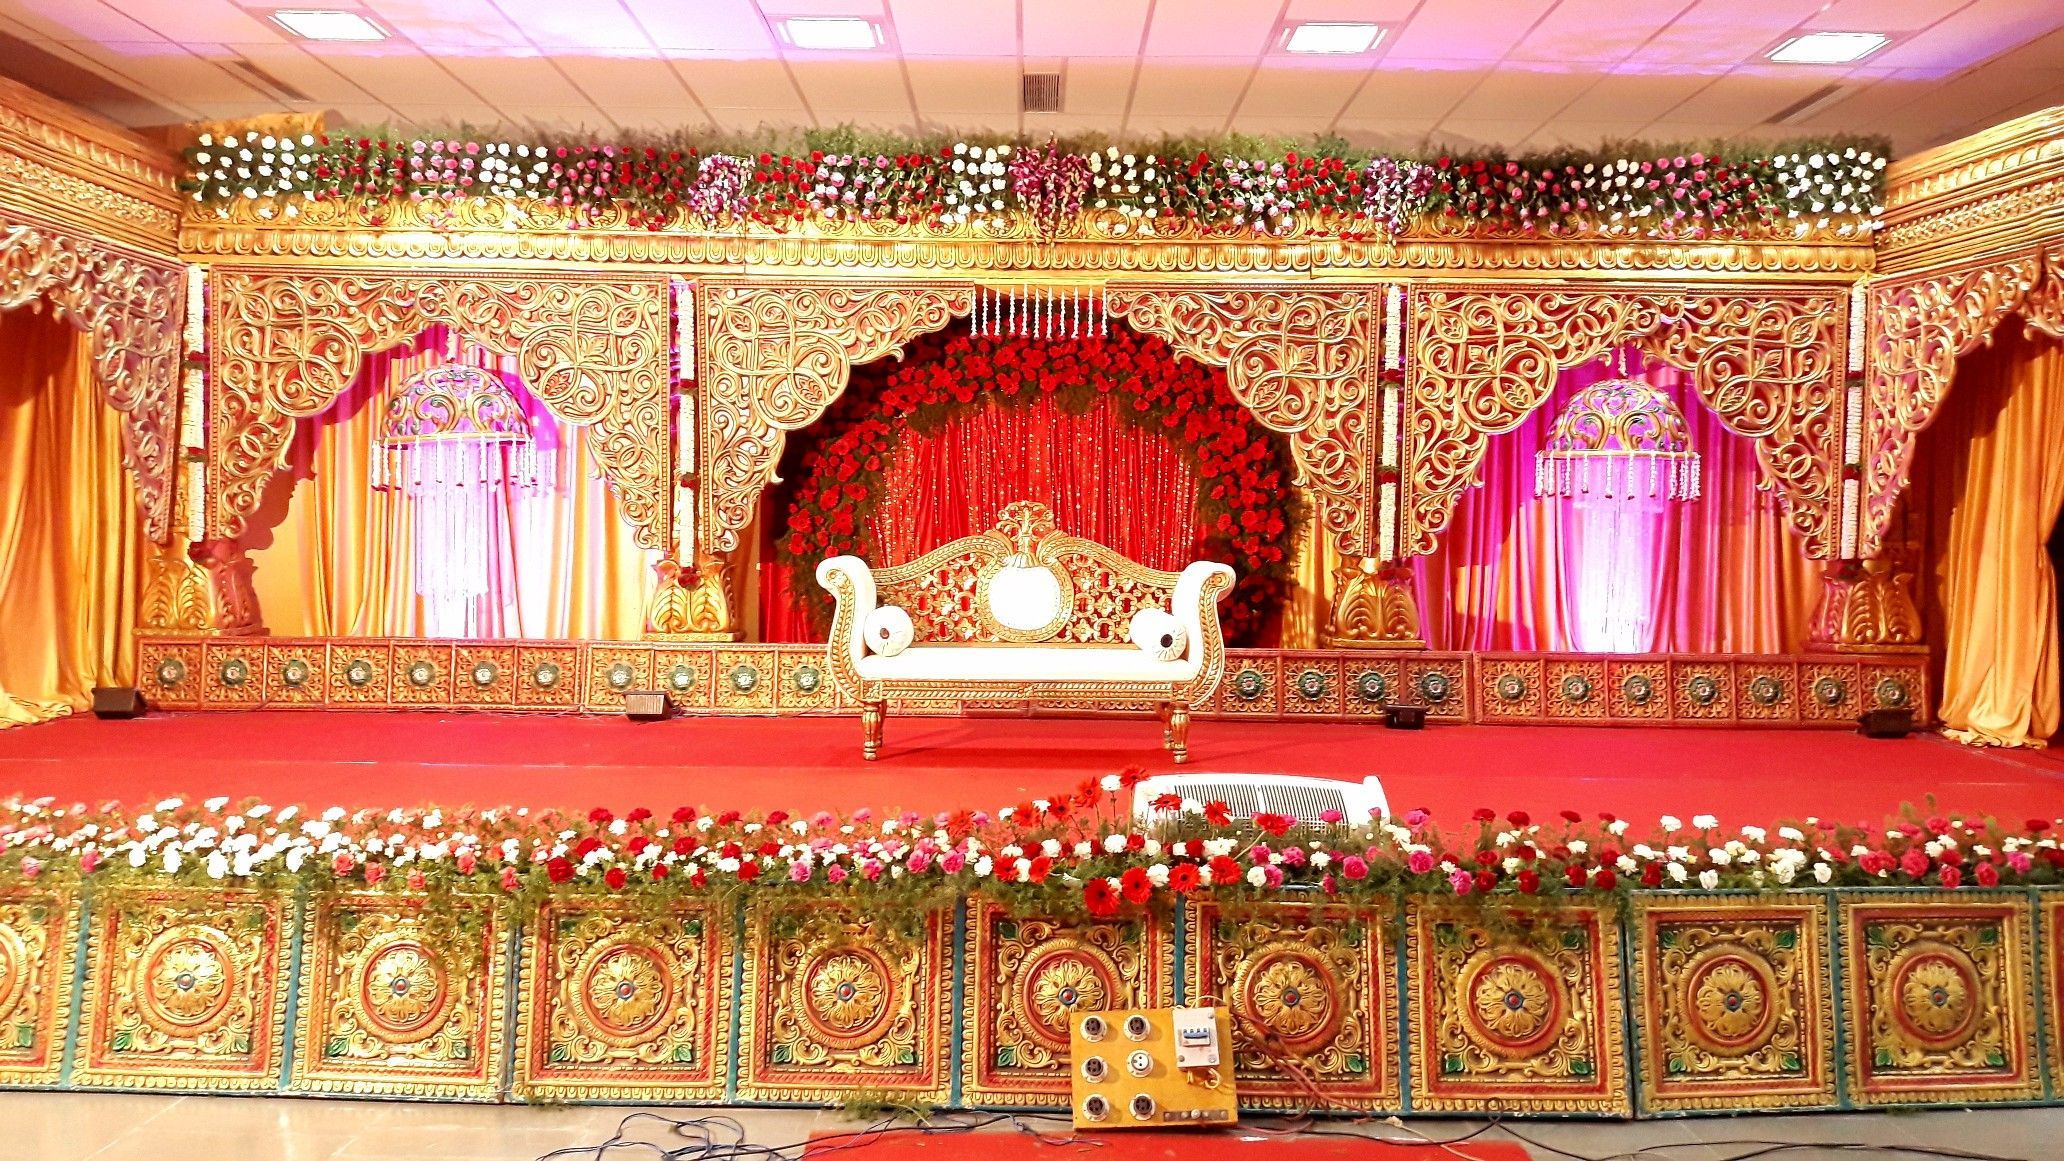 Kcm decorations  Palladam  Sai | wedding backdrop | Pinterest